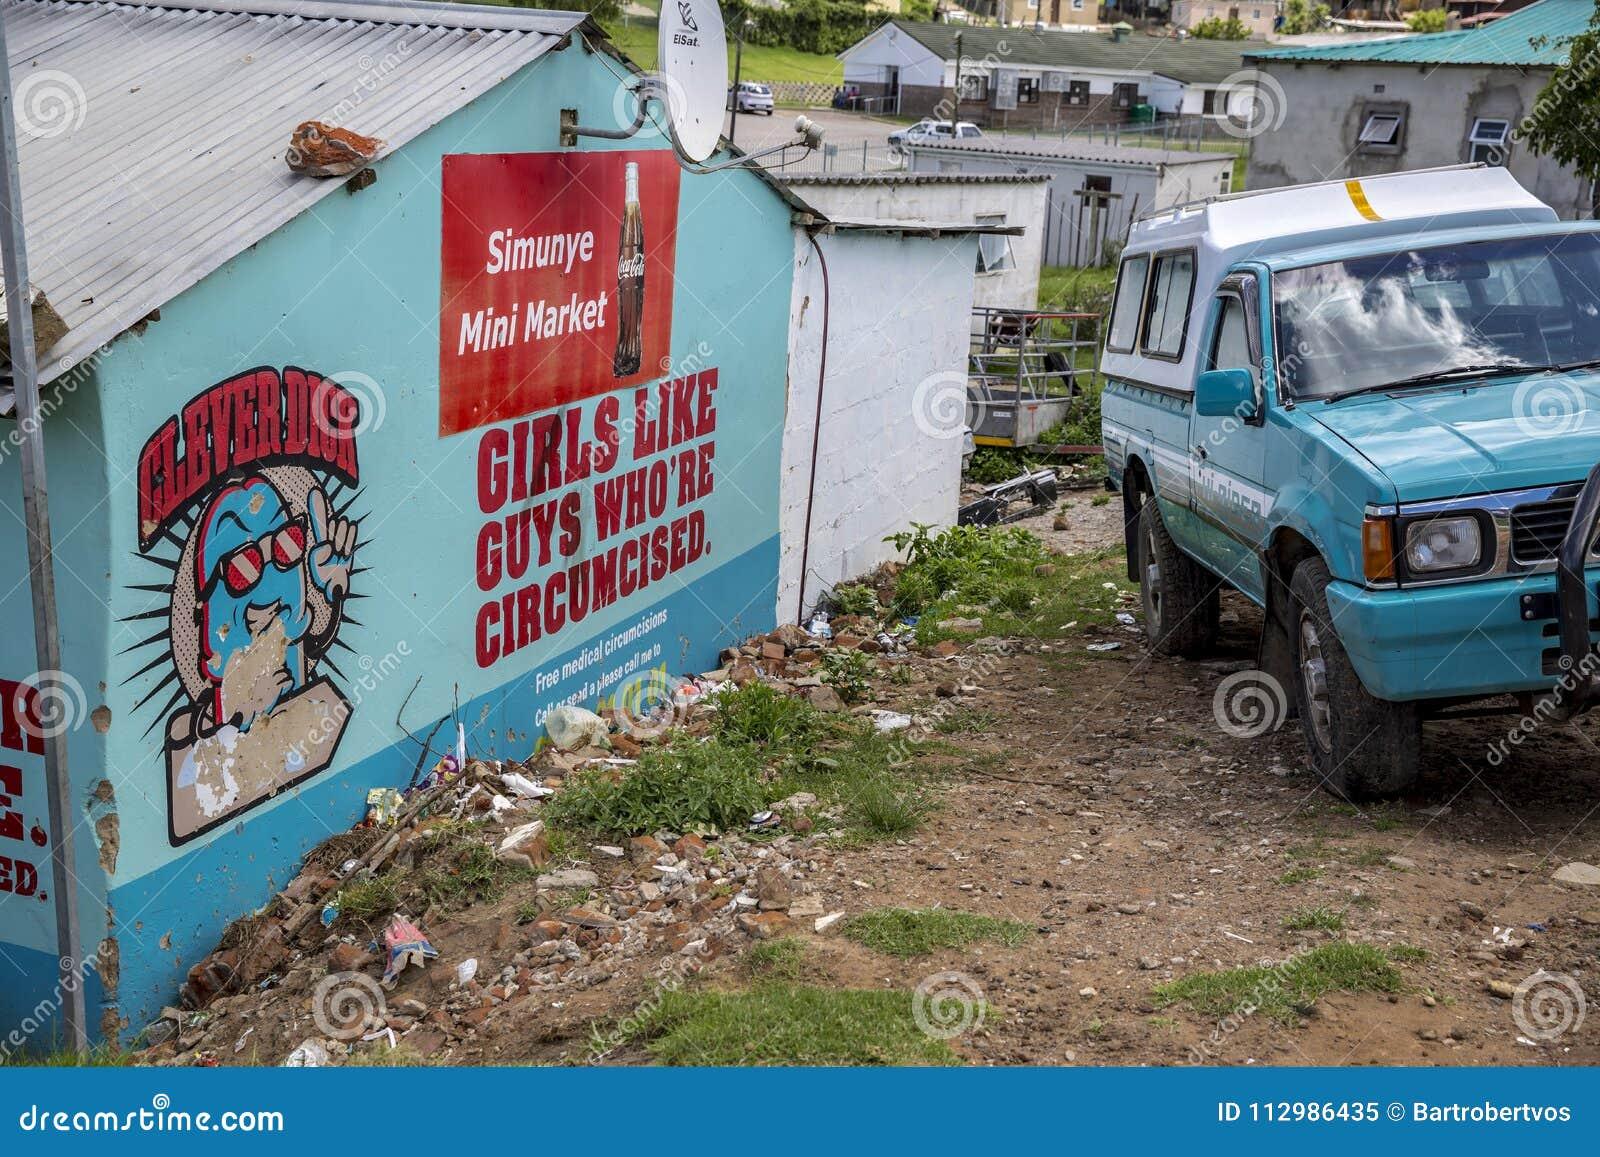 Circumcision ad in a township